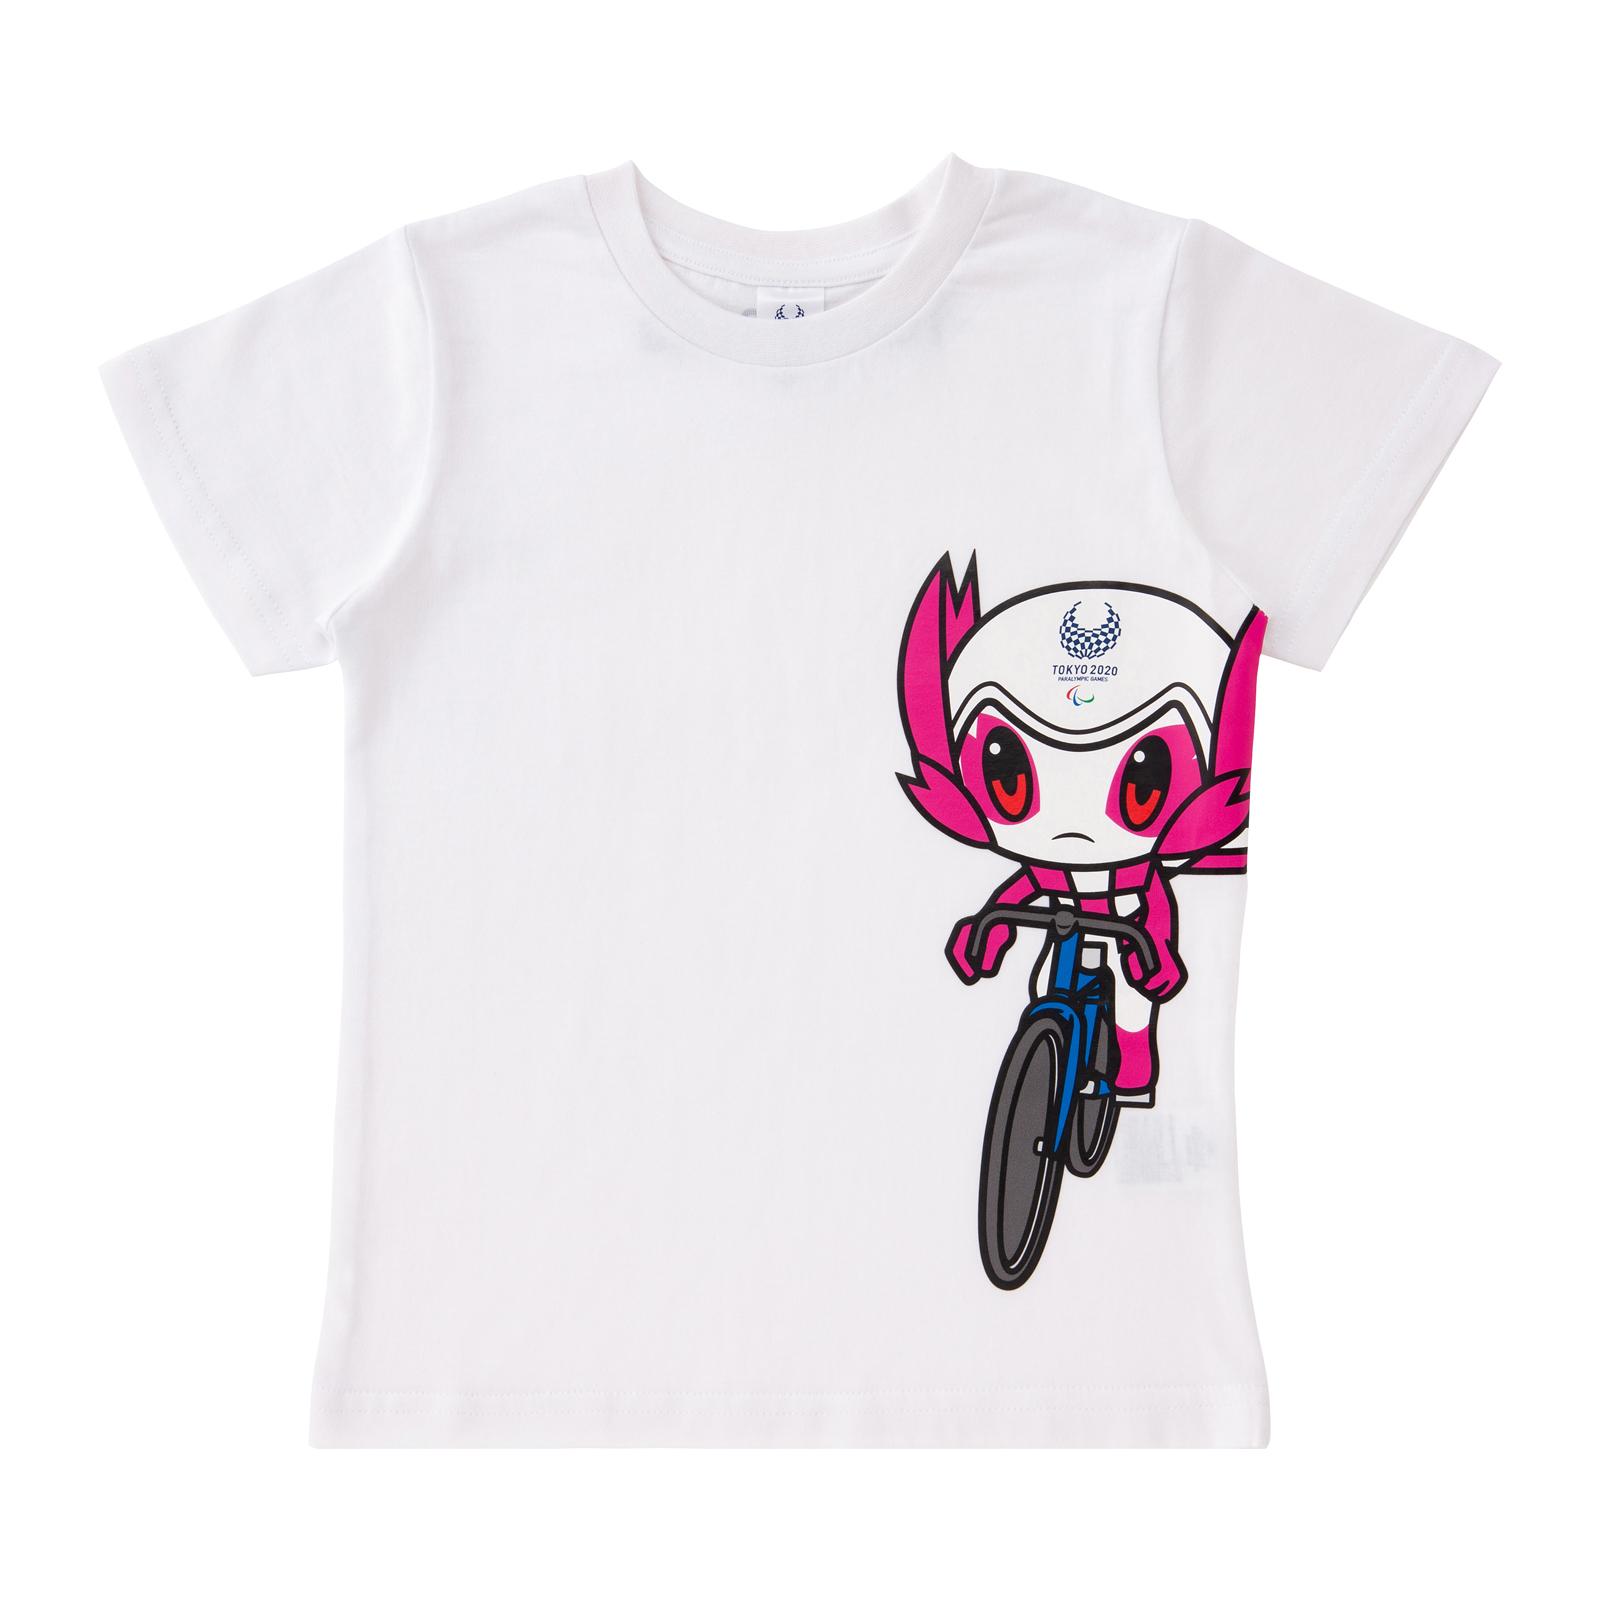 KIDSTシャツ 自転車競技 トラック(東京2020パラリンピックマスコット)